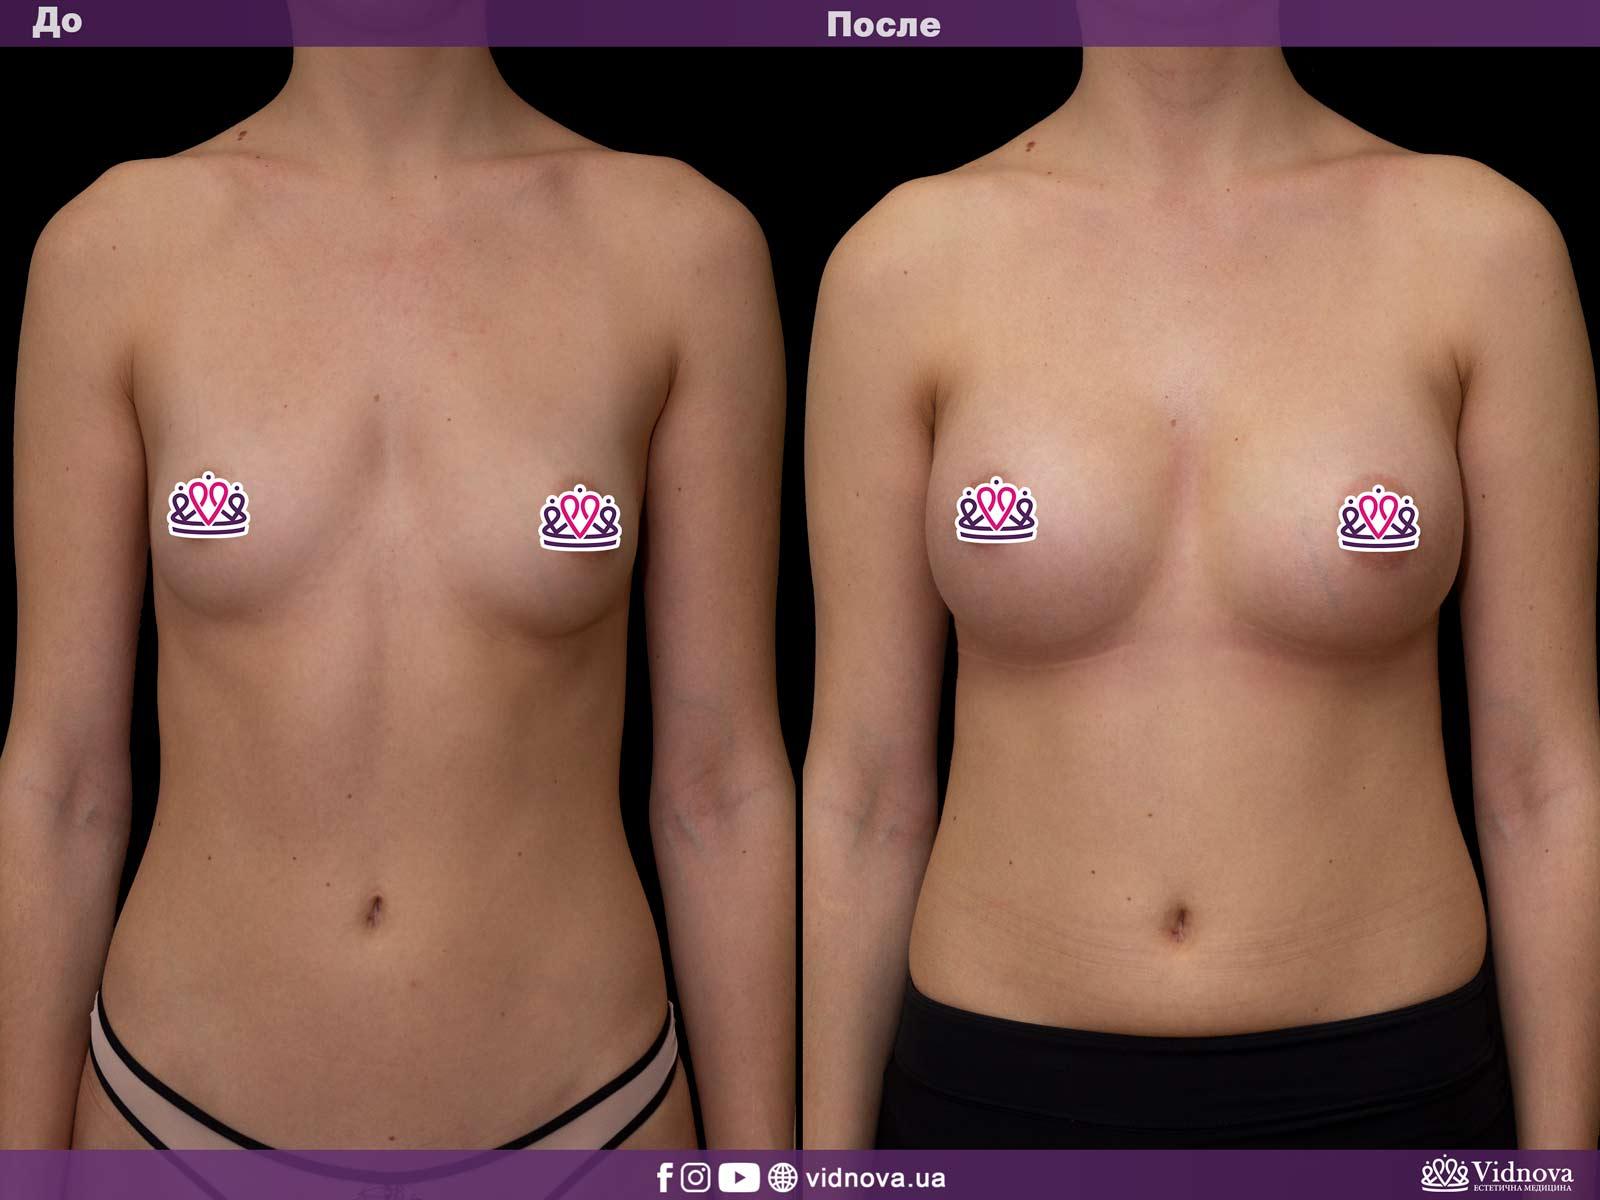 Увеличение груди: Фото ДО и ПОСЛЕ - Пример №25-1 - Клиника Vidnova